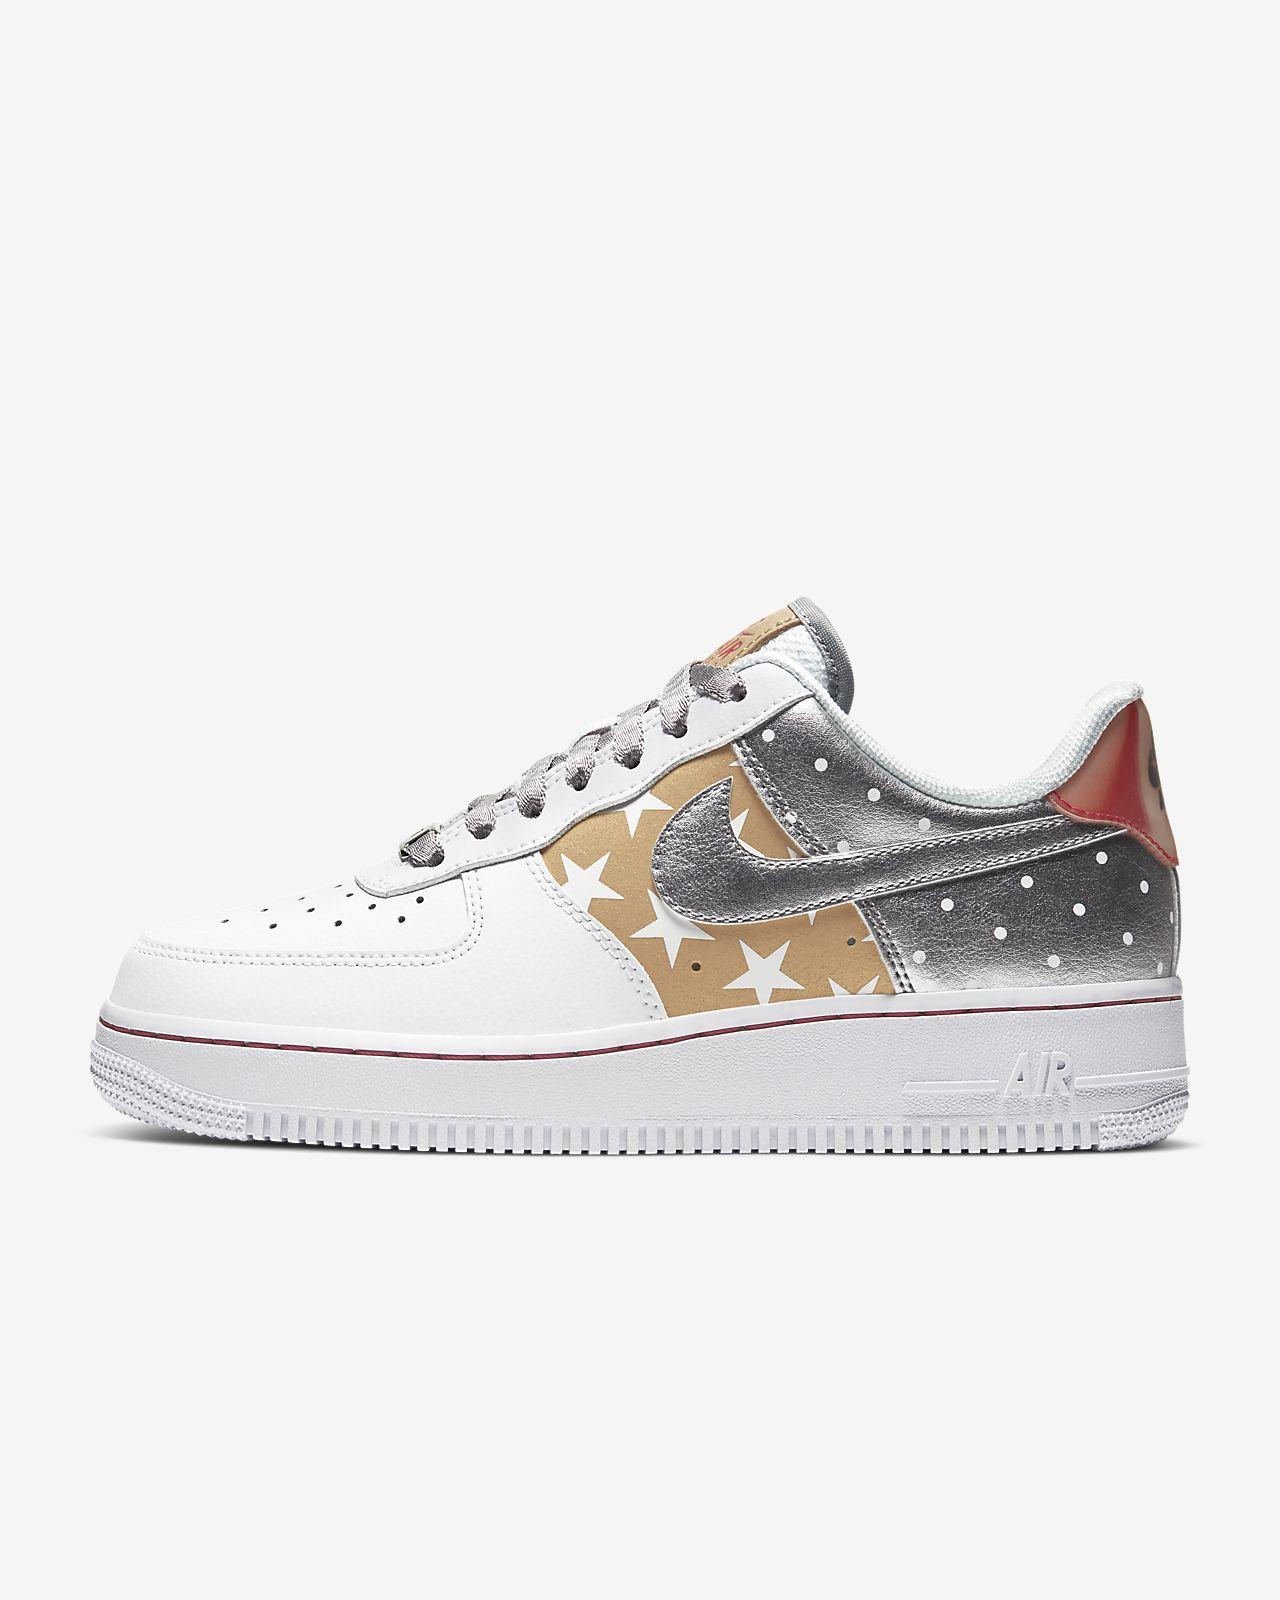 Nike Air Force 1 '07 sko